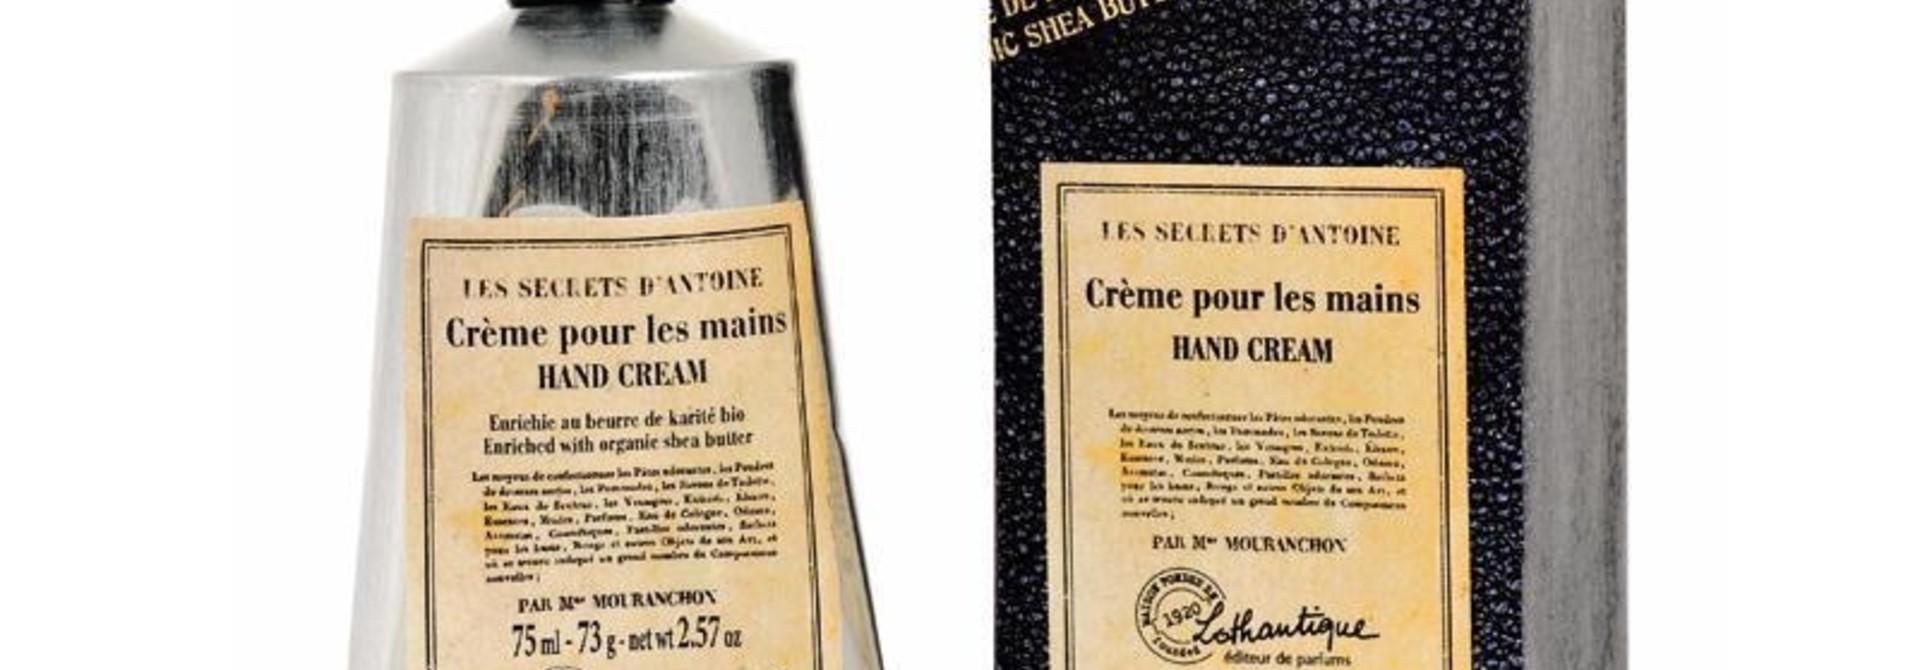 Les Secrets d'Antoine - 75mL Hand Cream